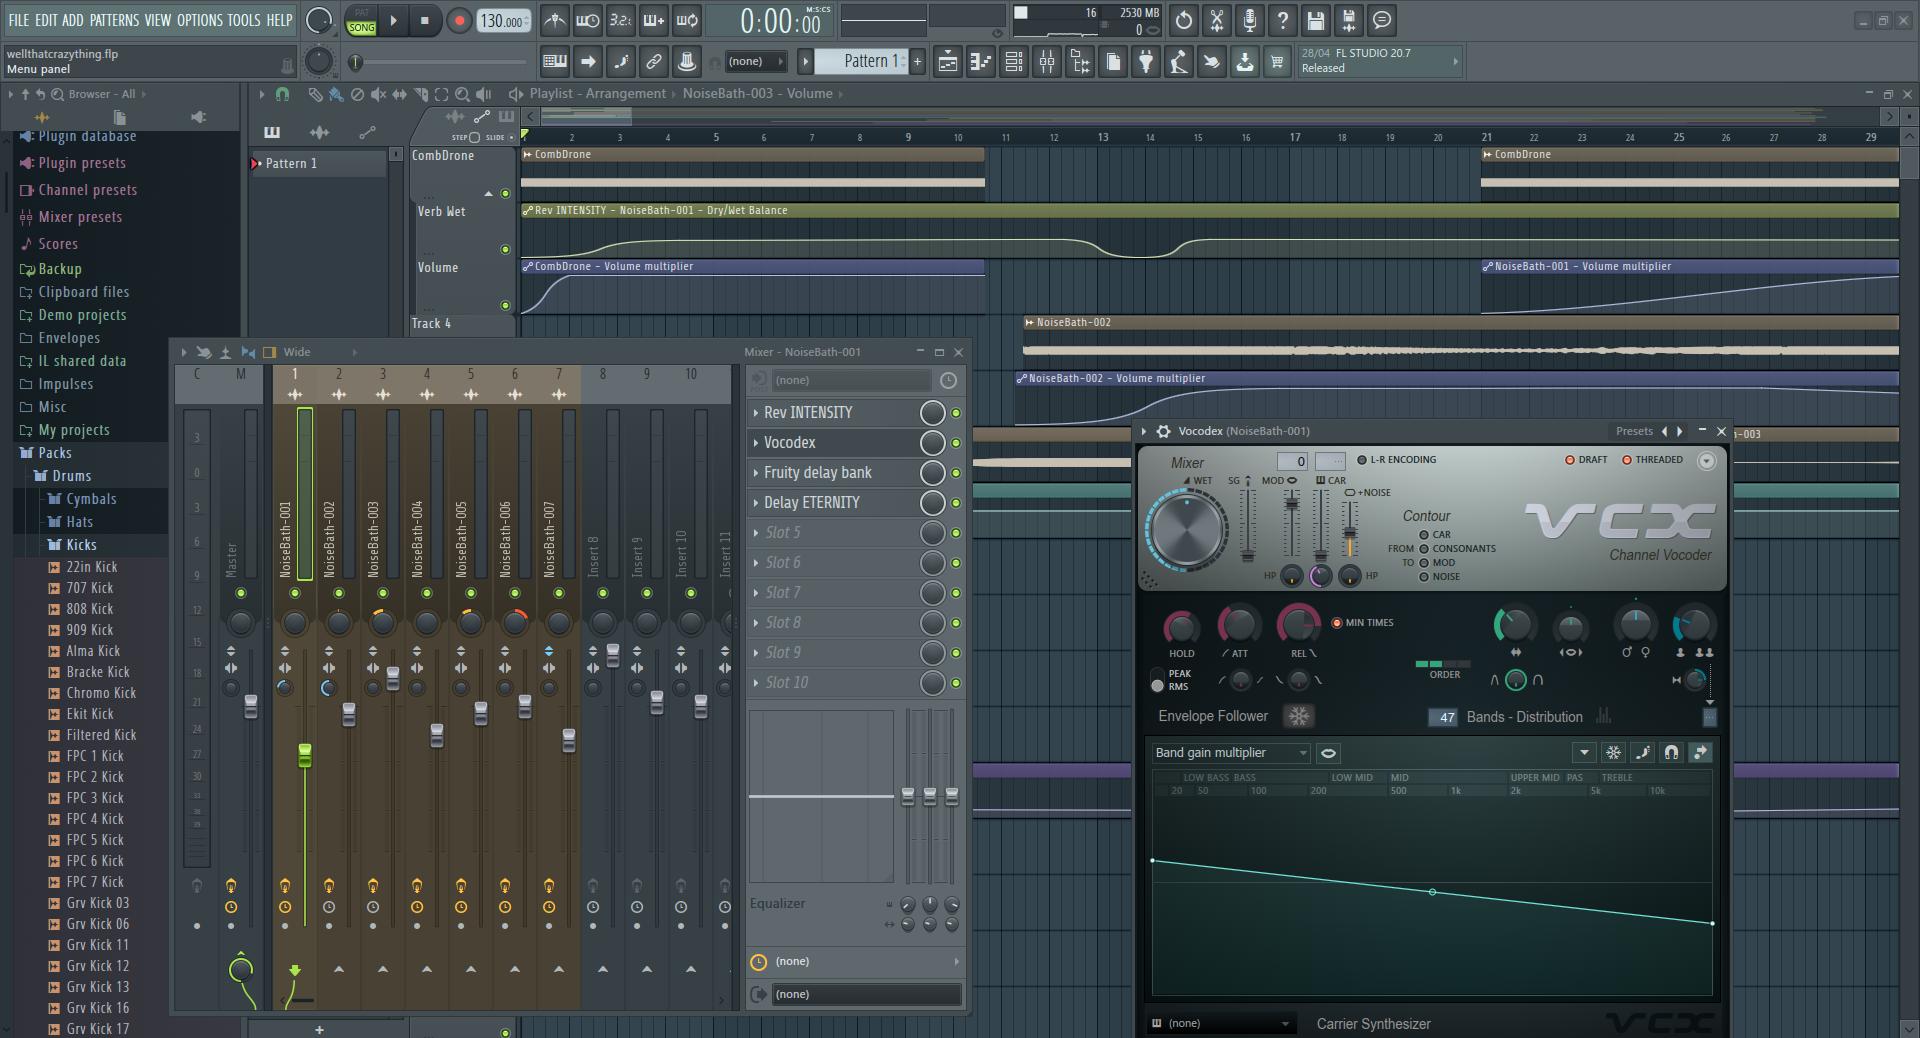 FL Studio 20.7 adds MIDI Scripting, new music video tools, in latest free update - CDM Create Digital Music